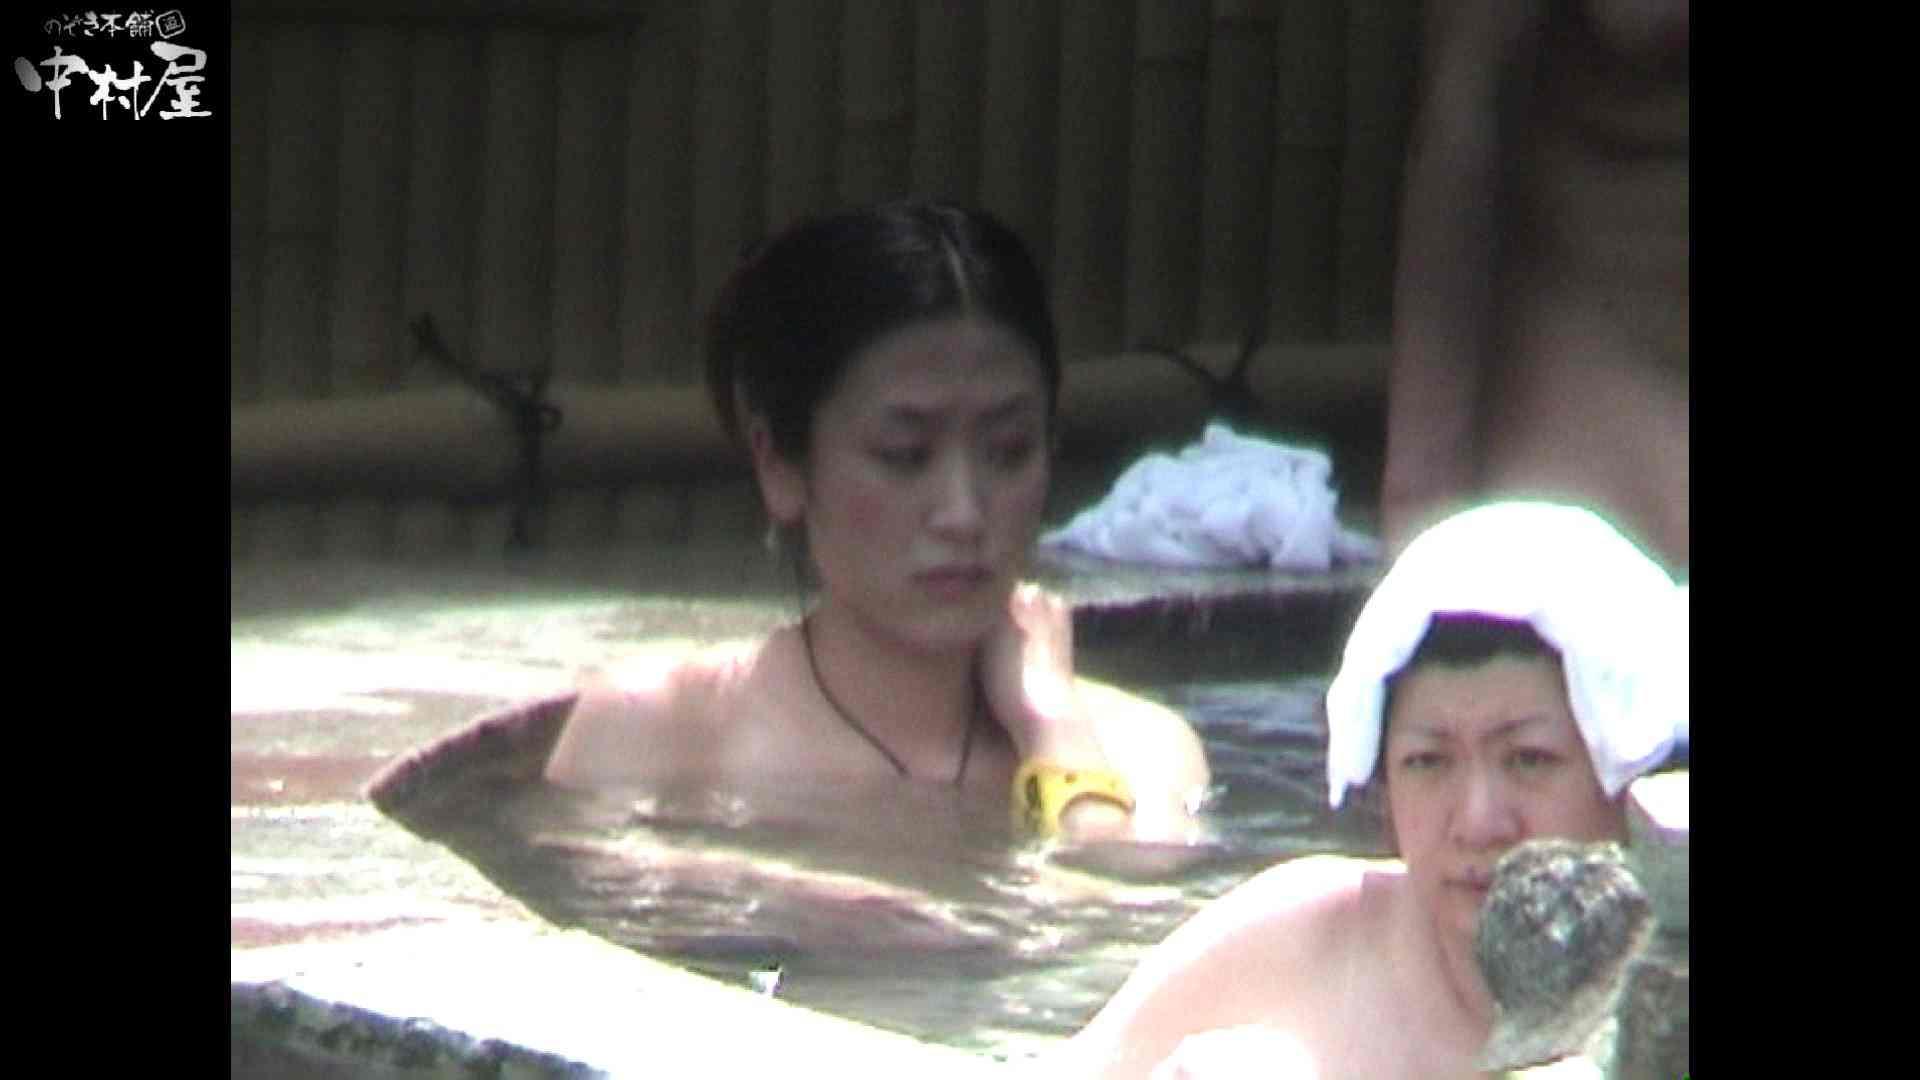 Aquaな露天風呂Vol.934 OLセックス  66画像 27